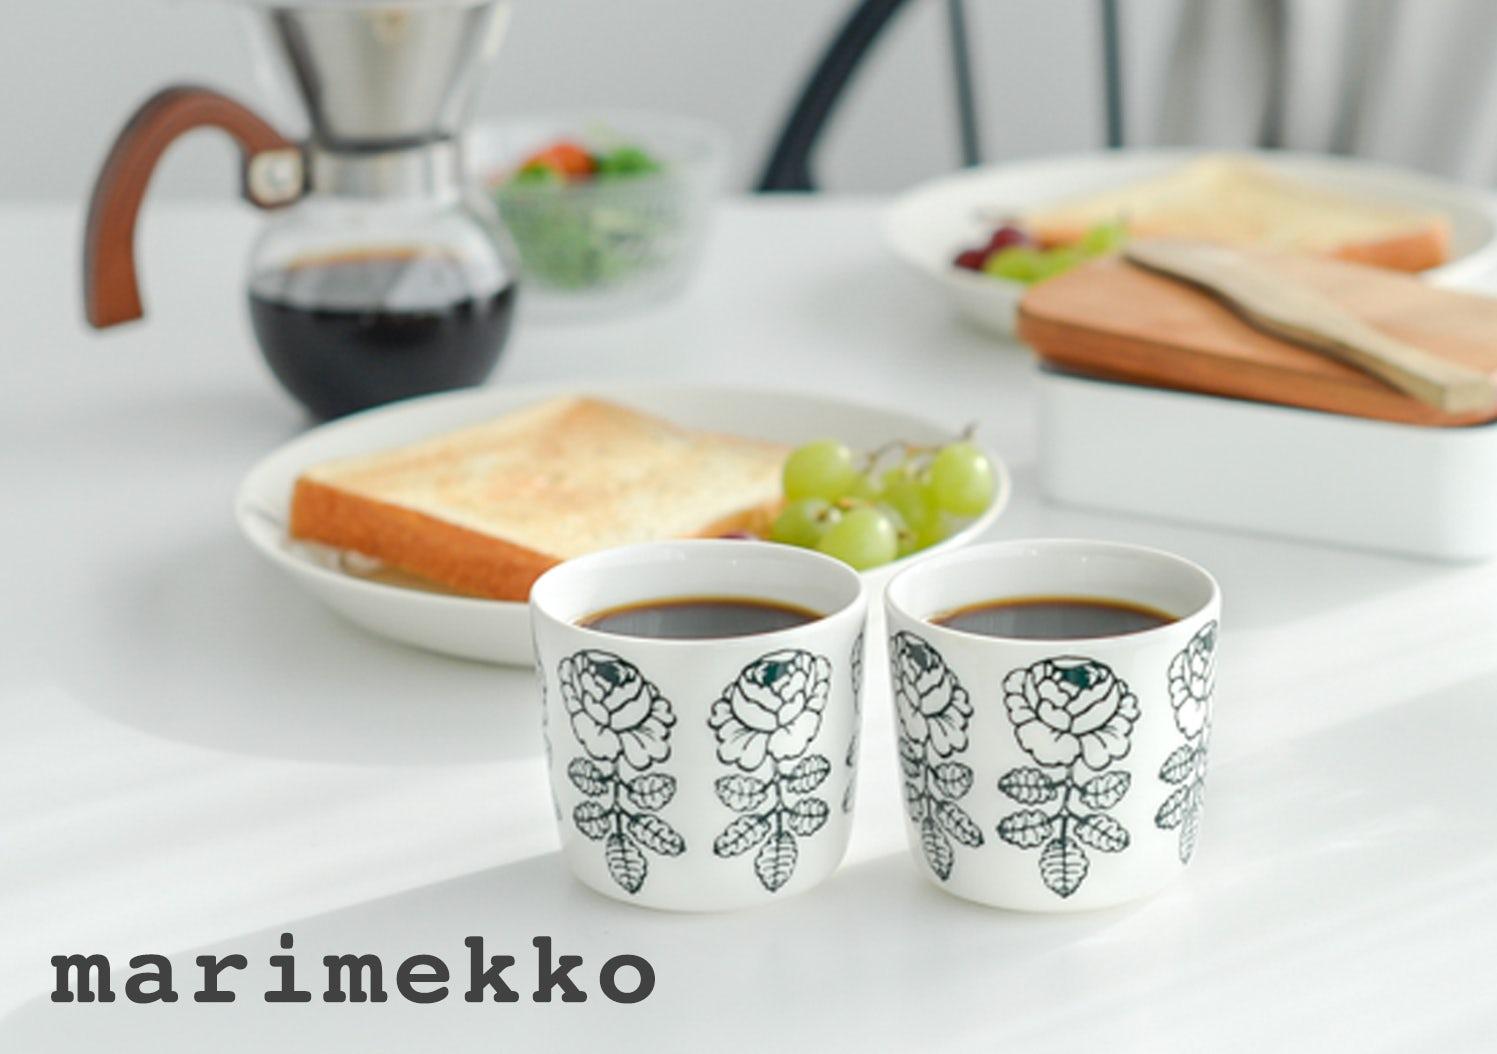 marimekko / マリメッコ / VIHKIRUUSU / ラテマグ2個セット(ダークグリーン)の画像